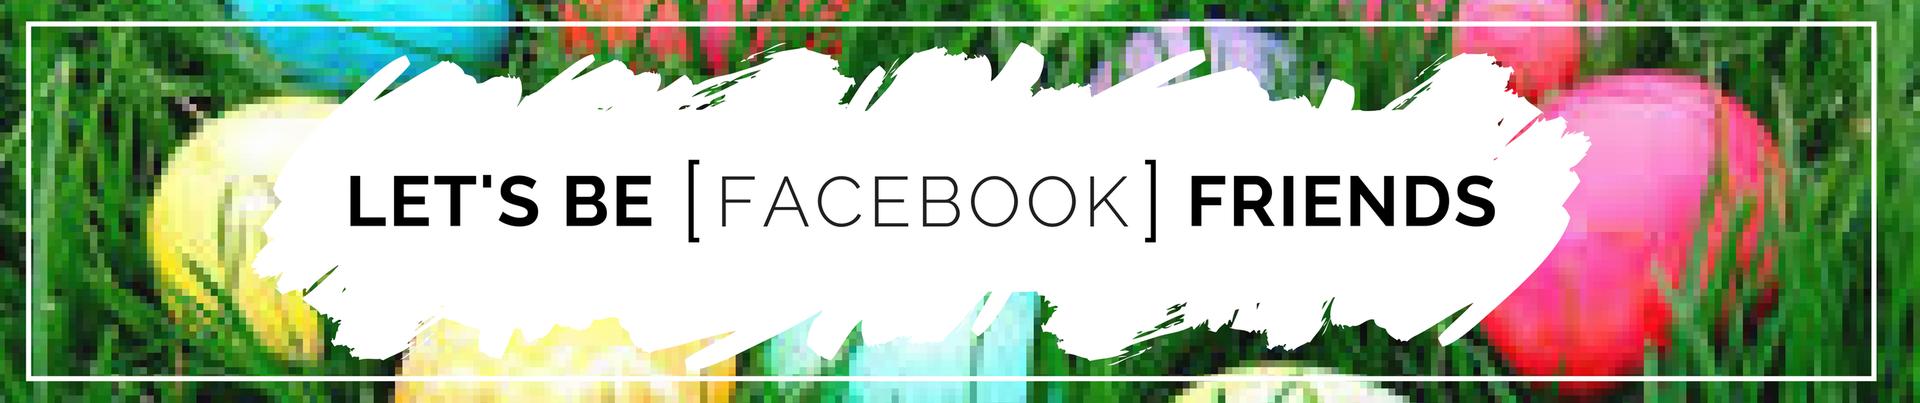 """https://www.facebook.com/cindykellyandassociates/"""